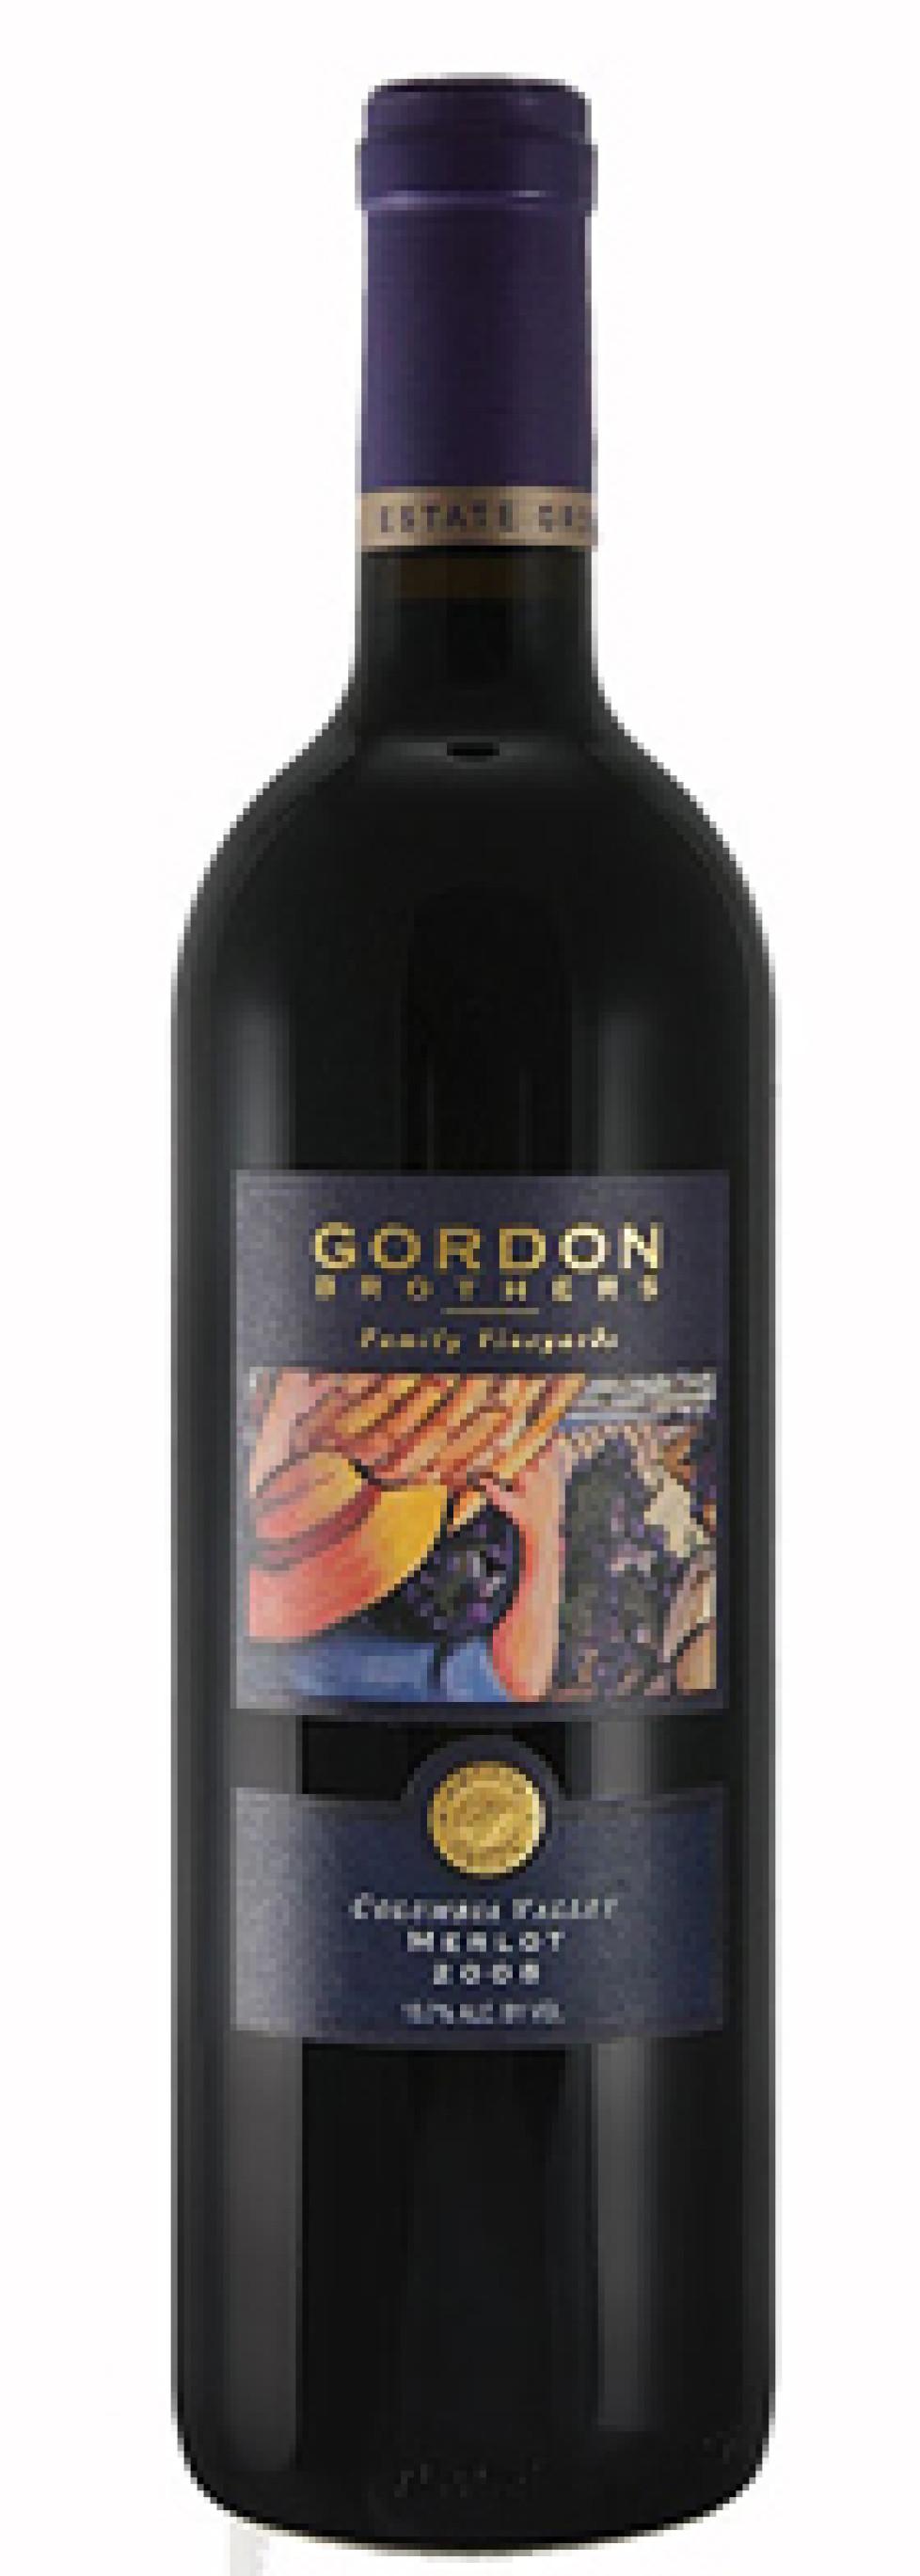 gordon-brothers-merlot-2008